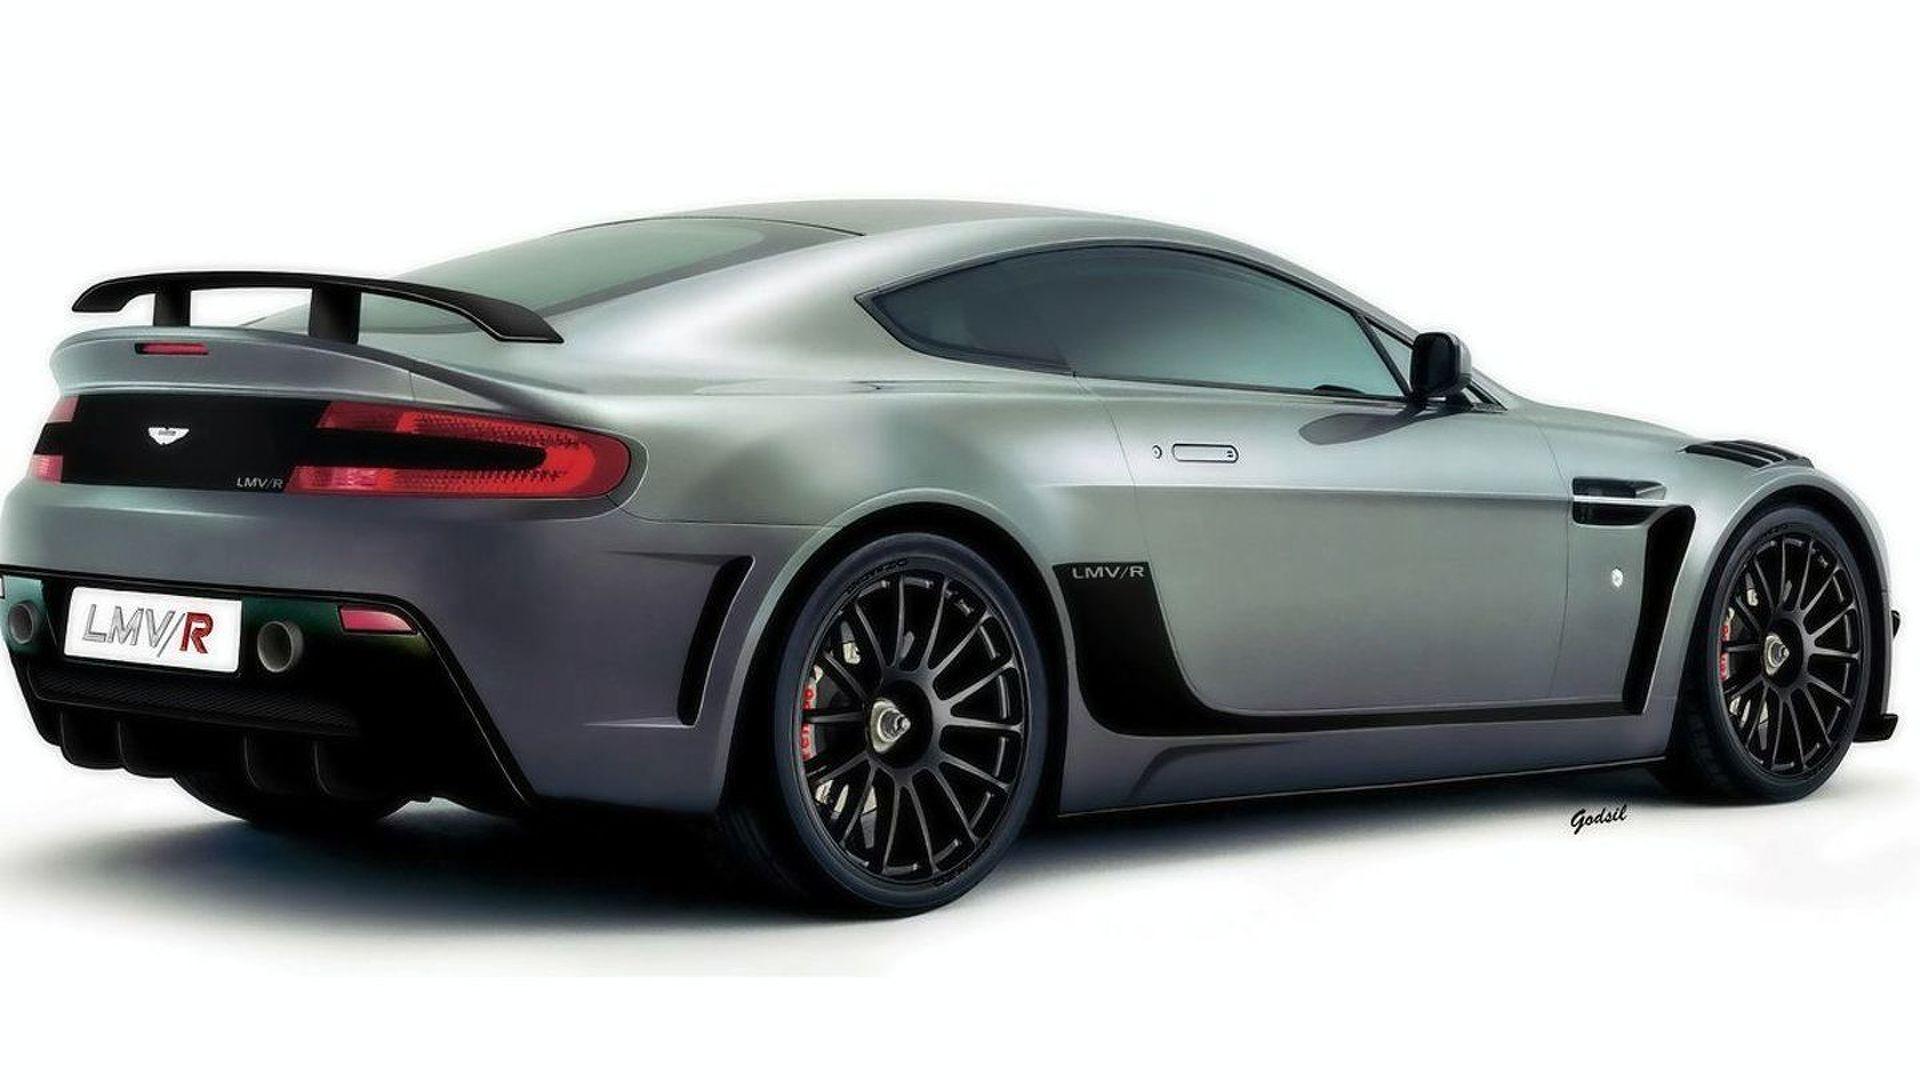 Elite Lmv R Based On 2010 Aston Martin Vantage